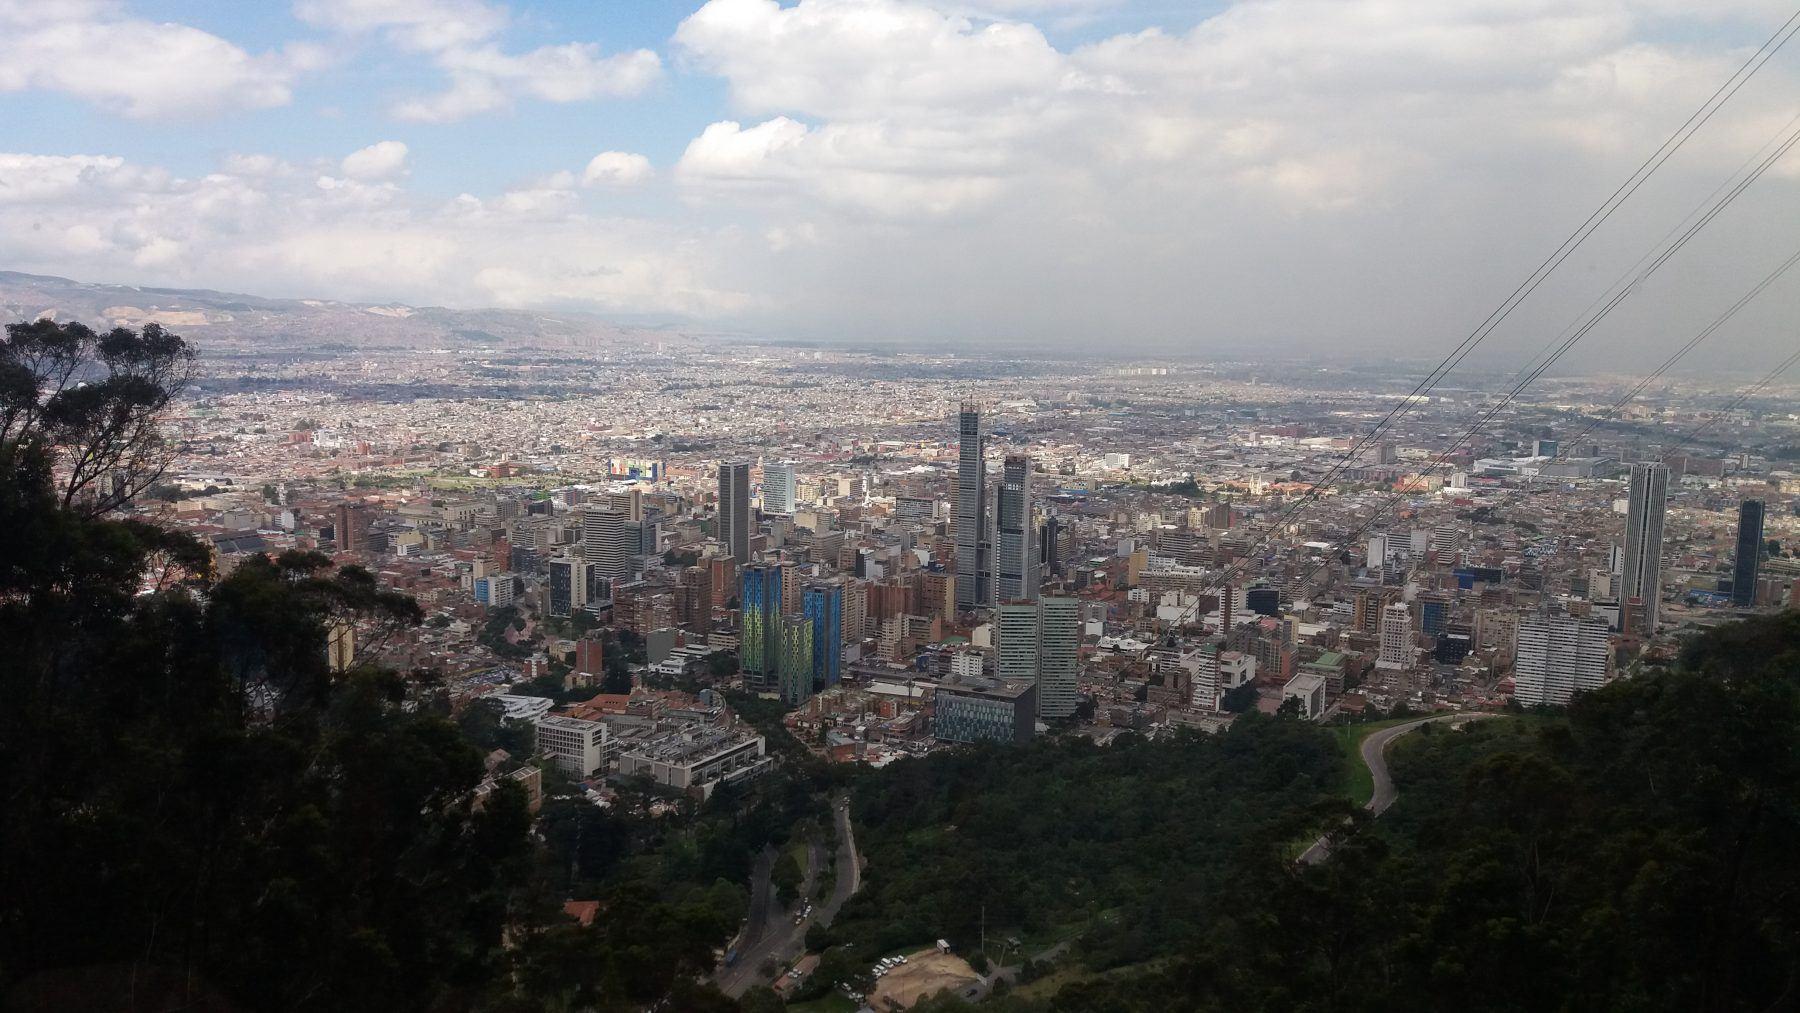 Bogota City Crawl - Monserrate